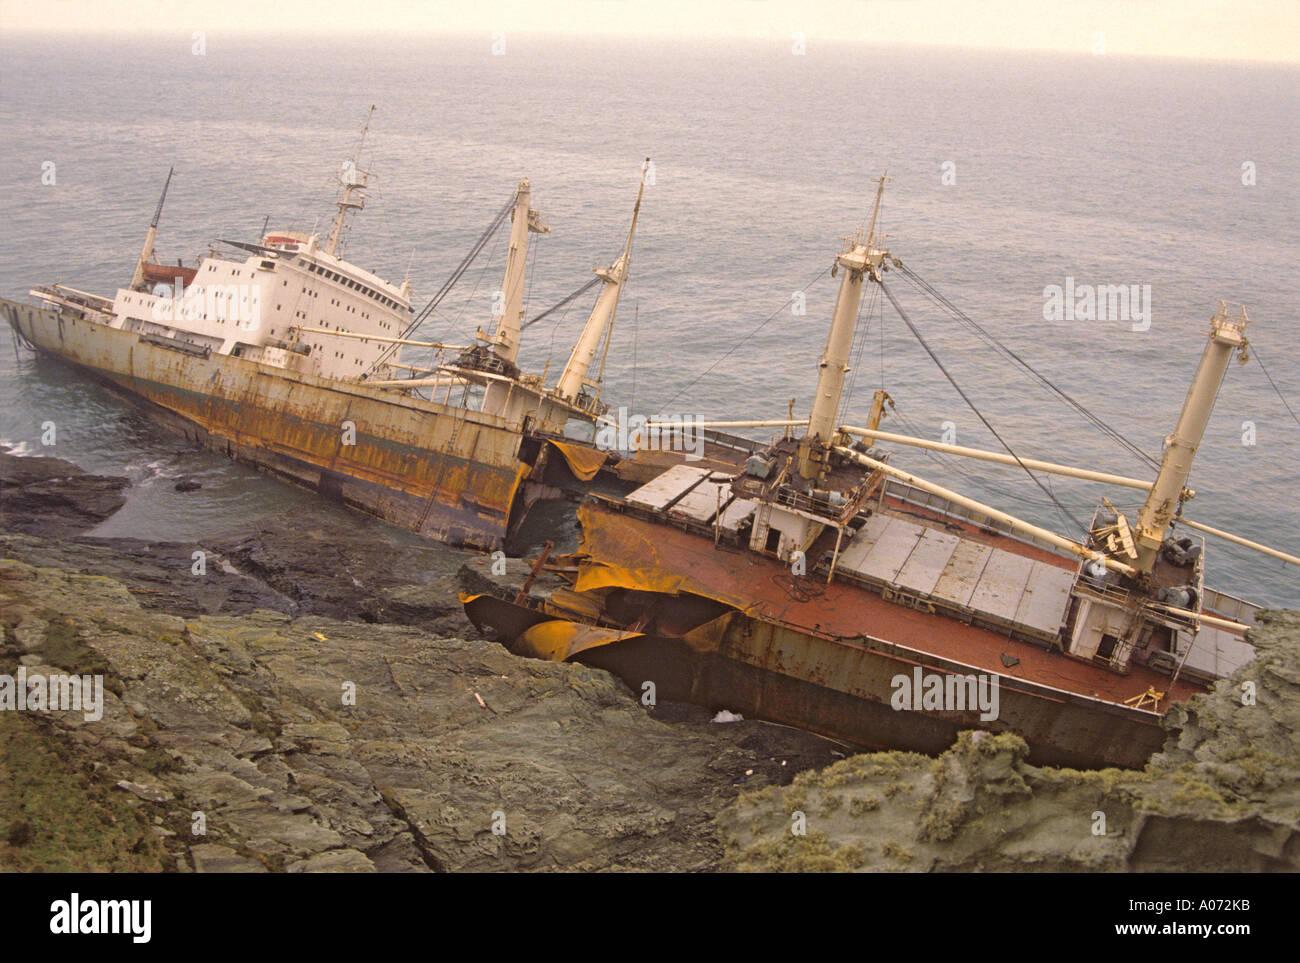 '^Shipwreck, 'Start Point', Devon' - Stock Image